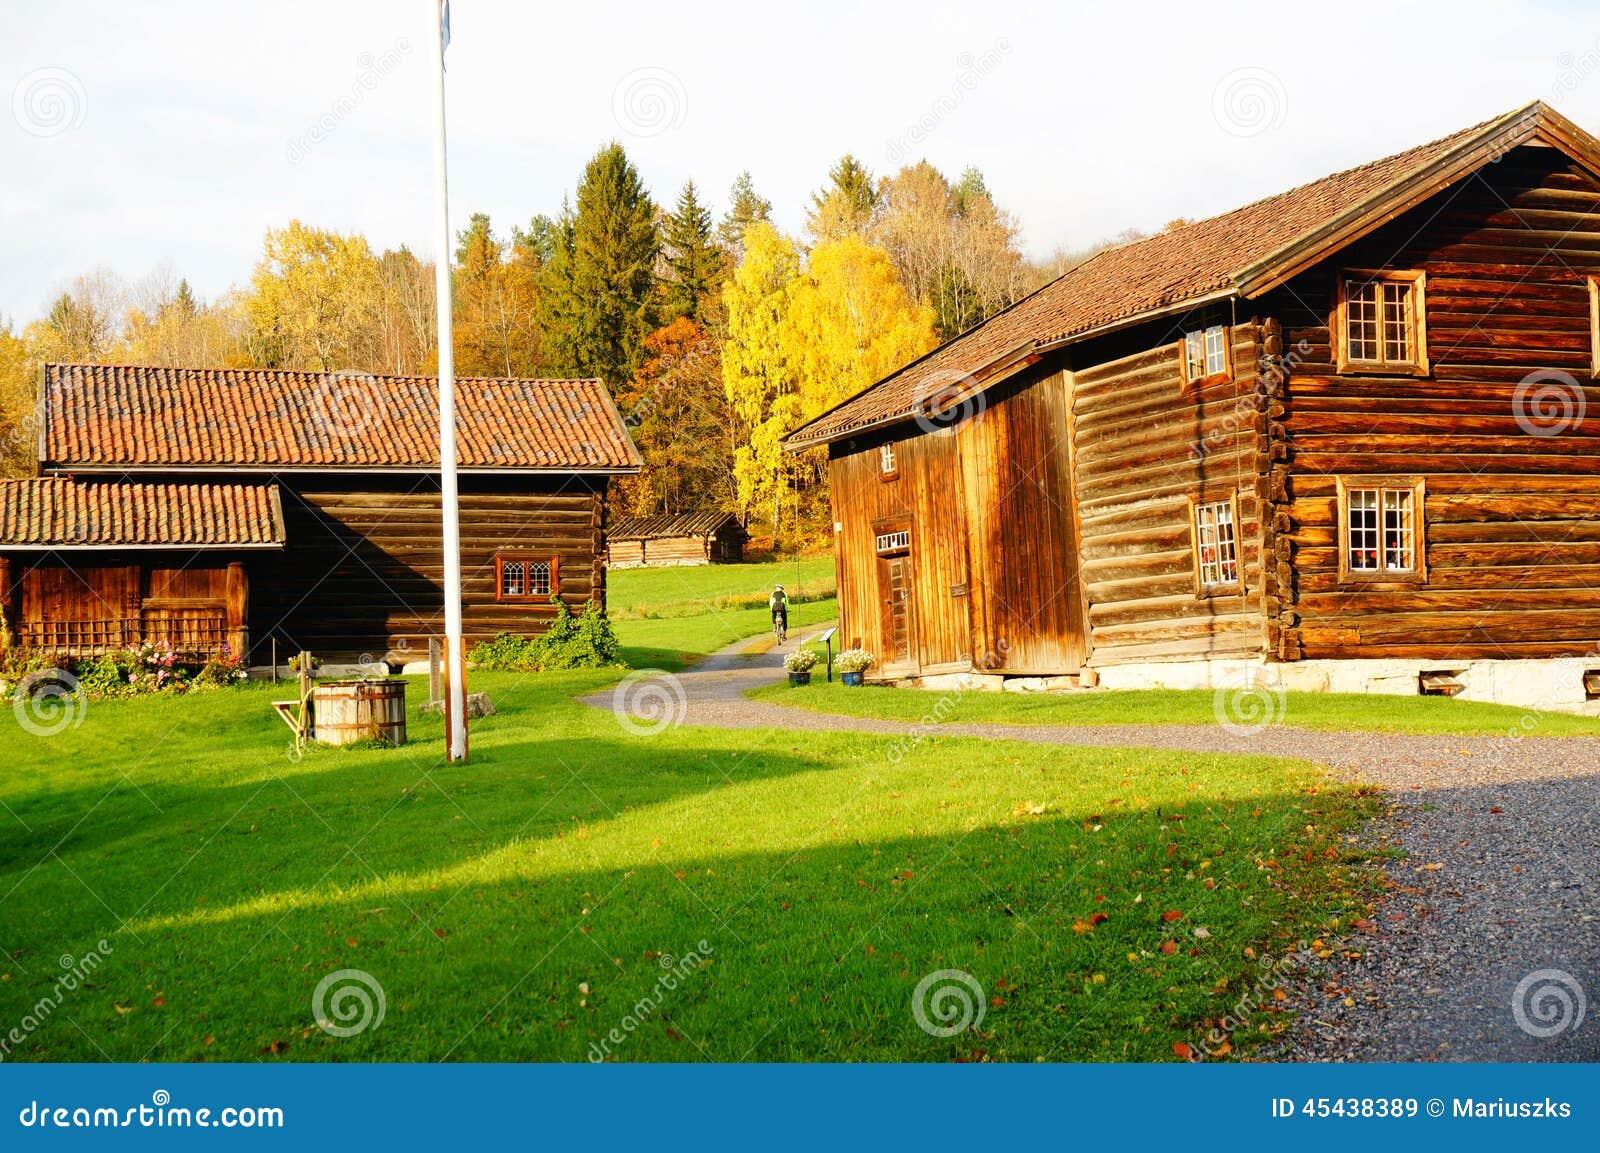 Norwegian Wooden Farm Houses Stock Image